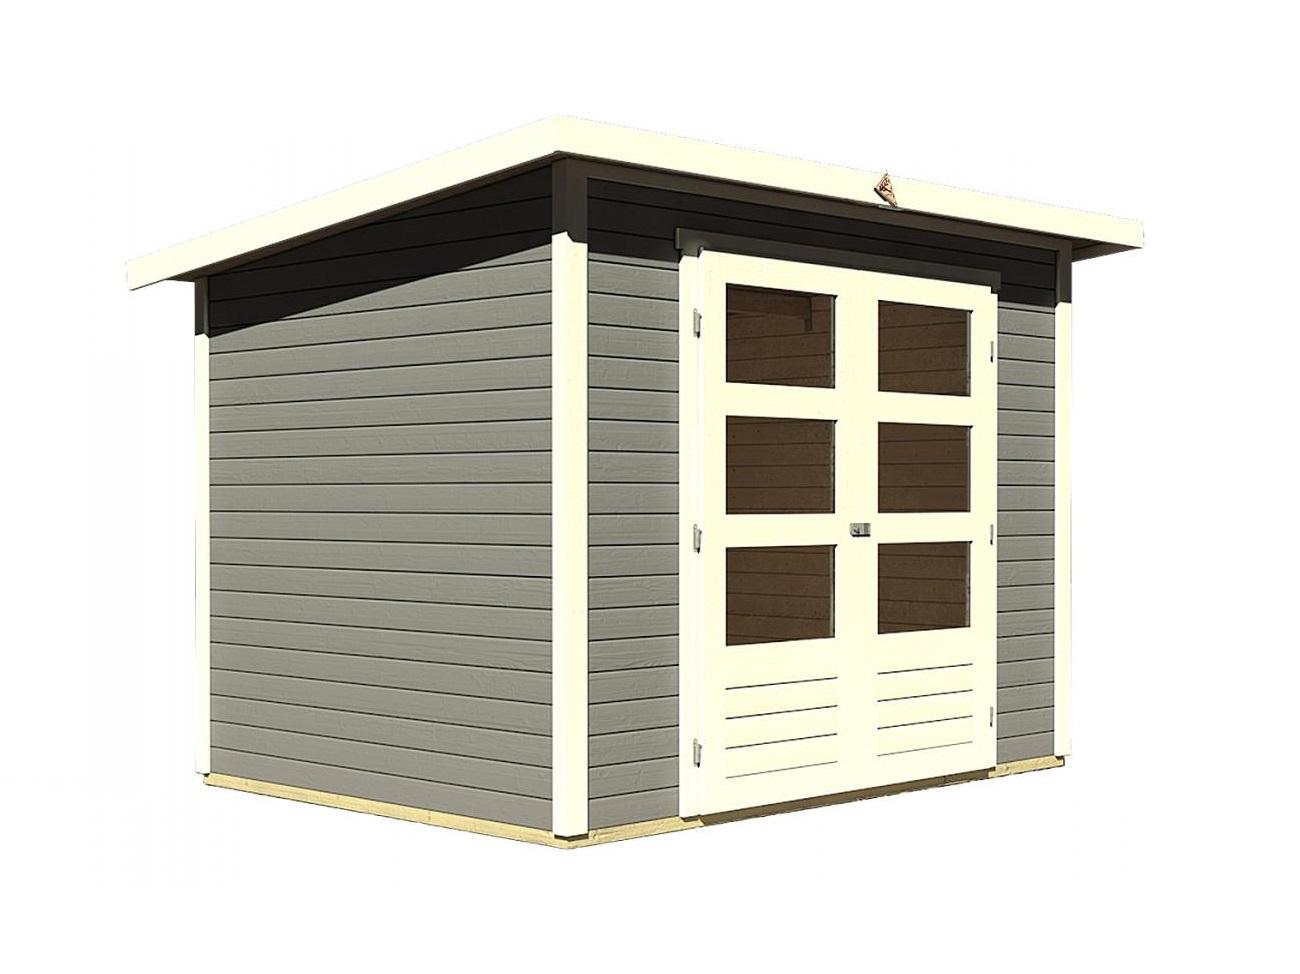 dřevěný domek KARIBU STOCKACH 3 (82979) tm. šedý